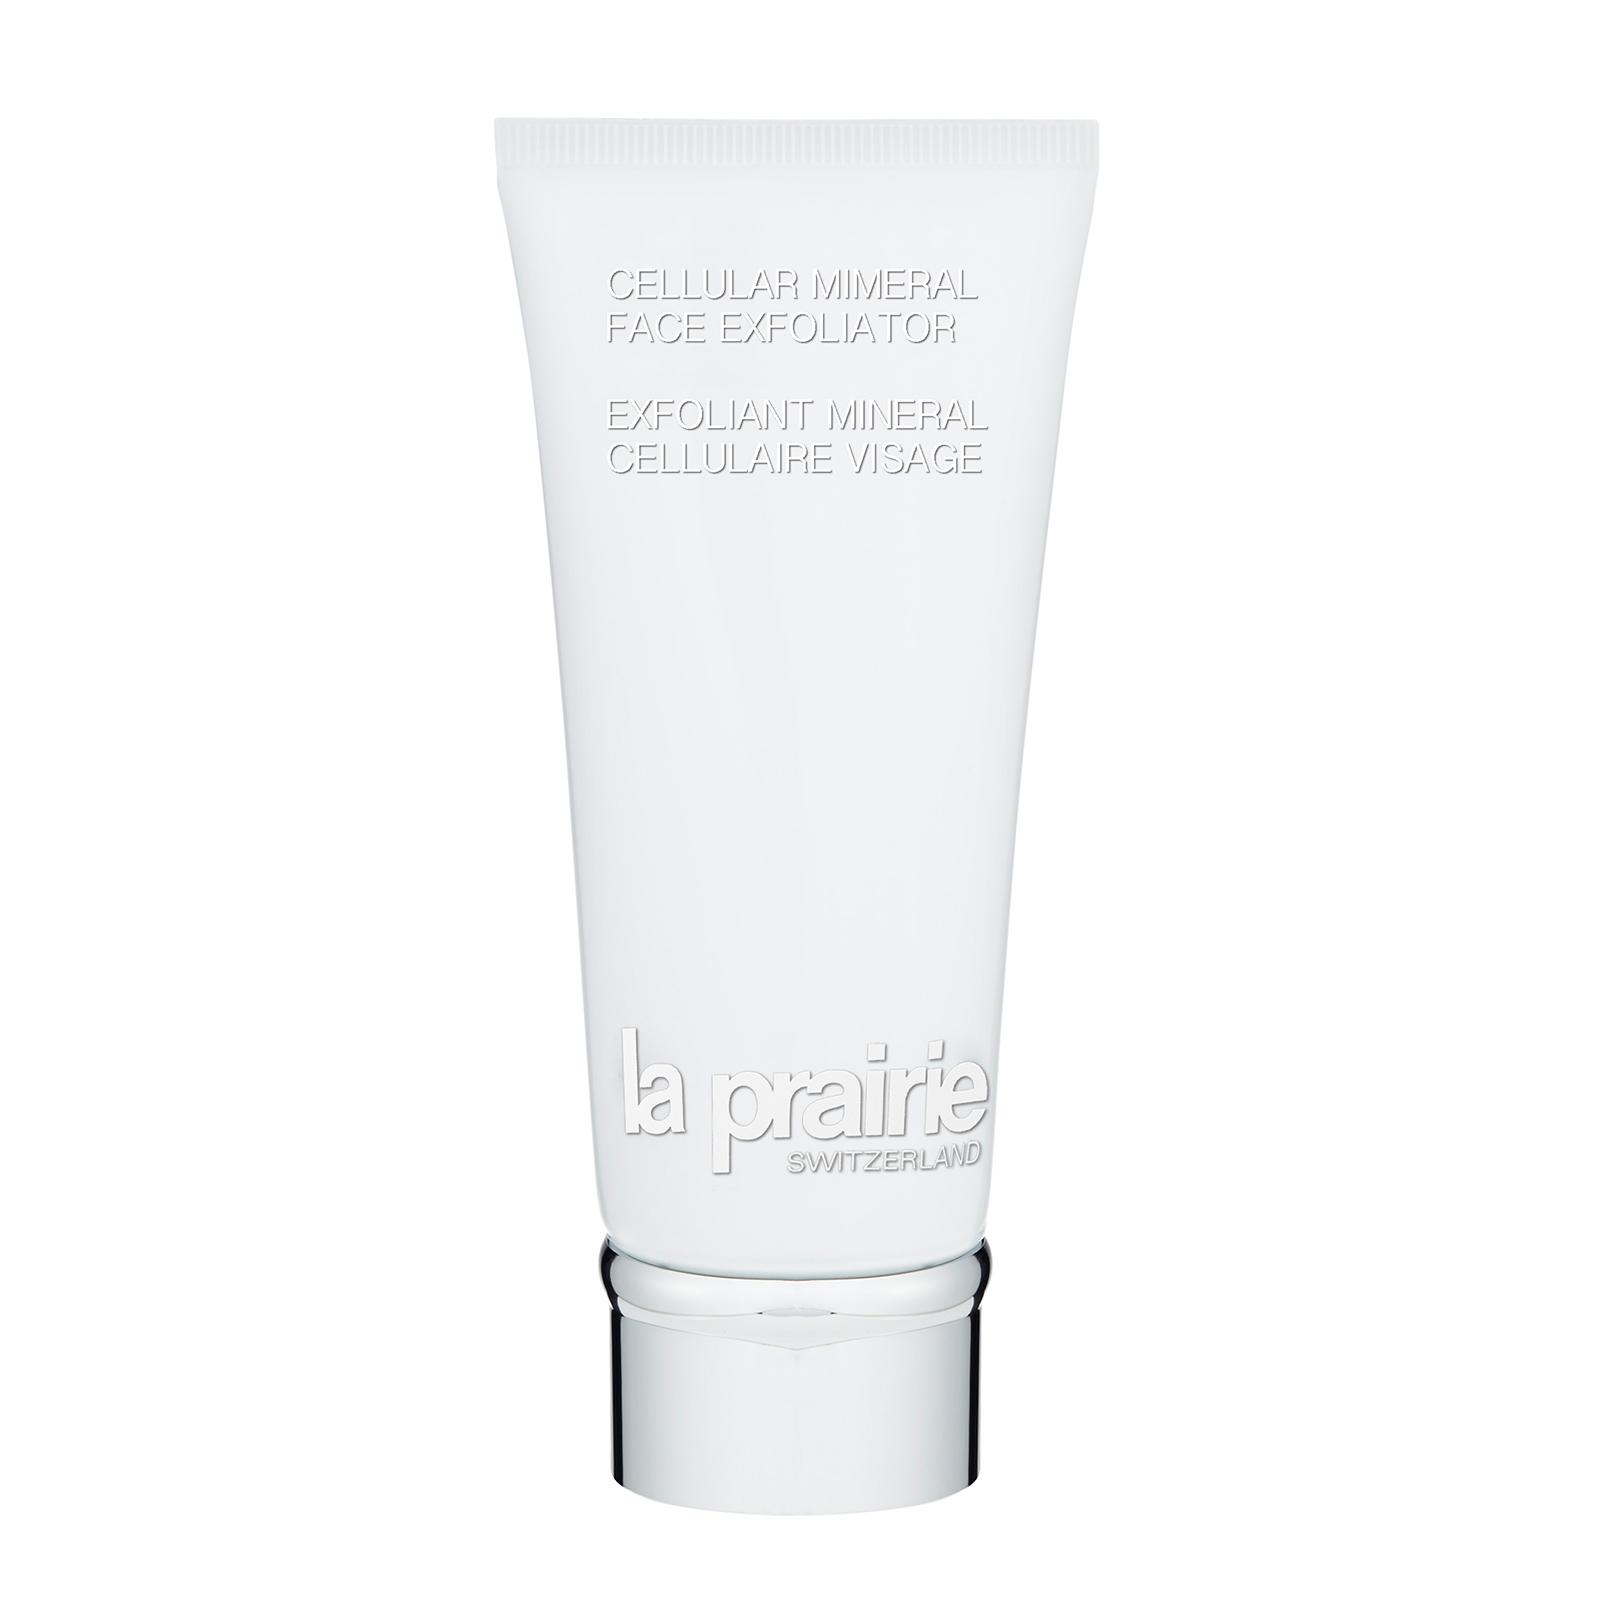 La Prairie Cellular Mineral Face Exfoliator (For All Skin Types) 3.4oz, 100ml